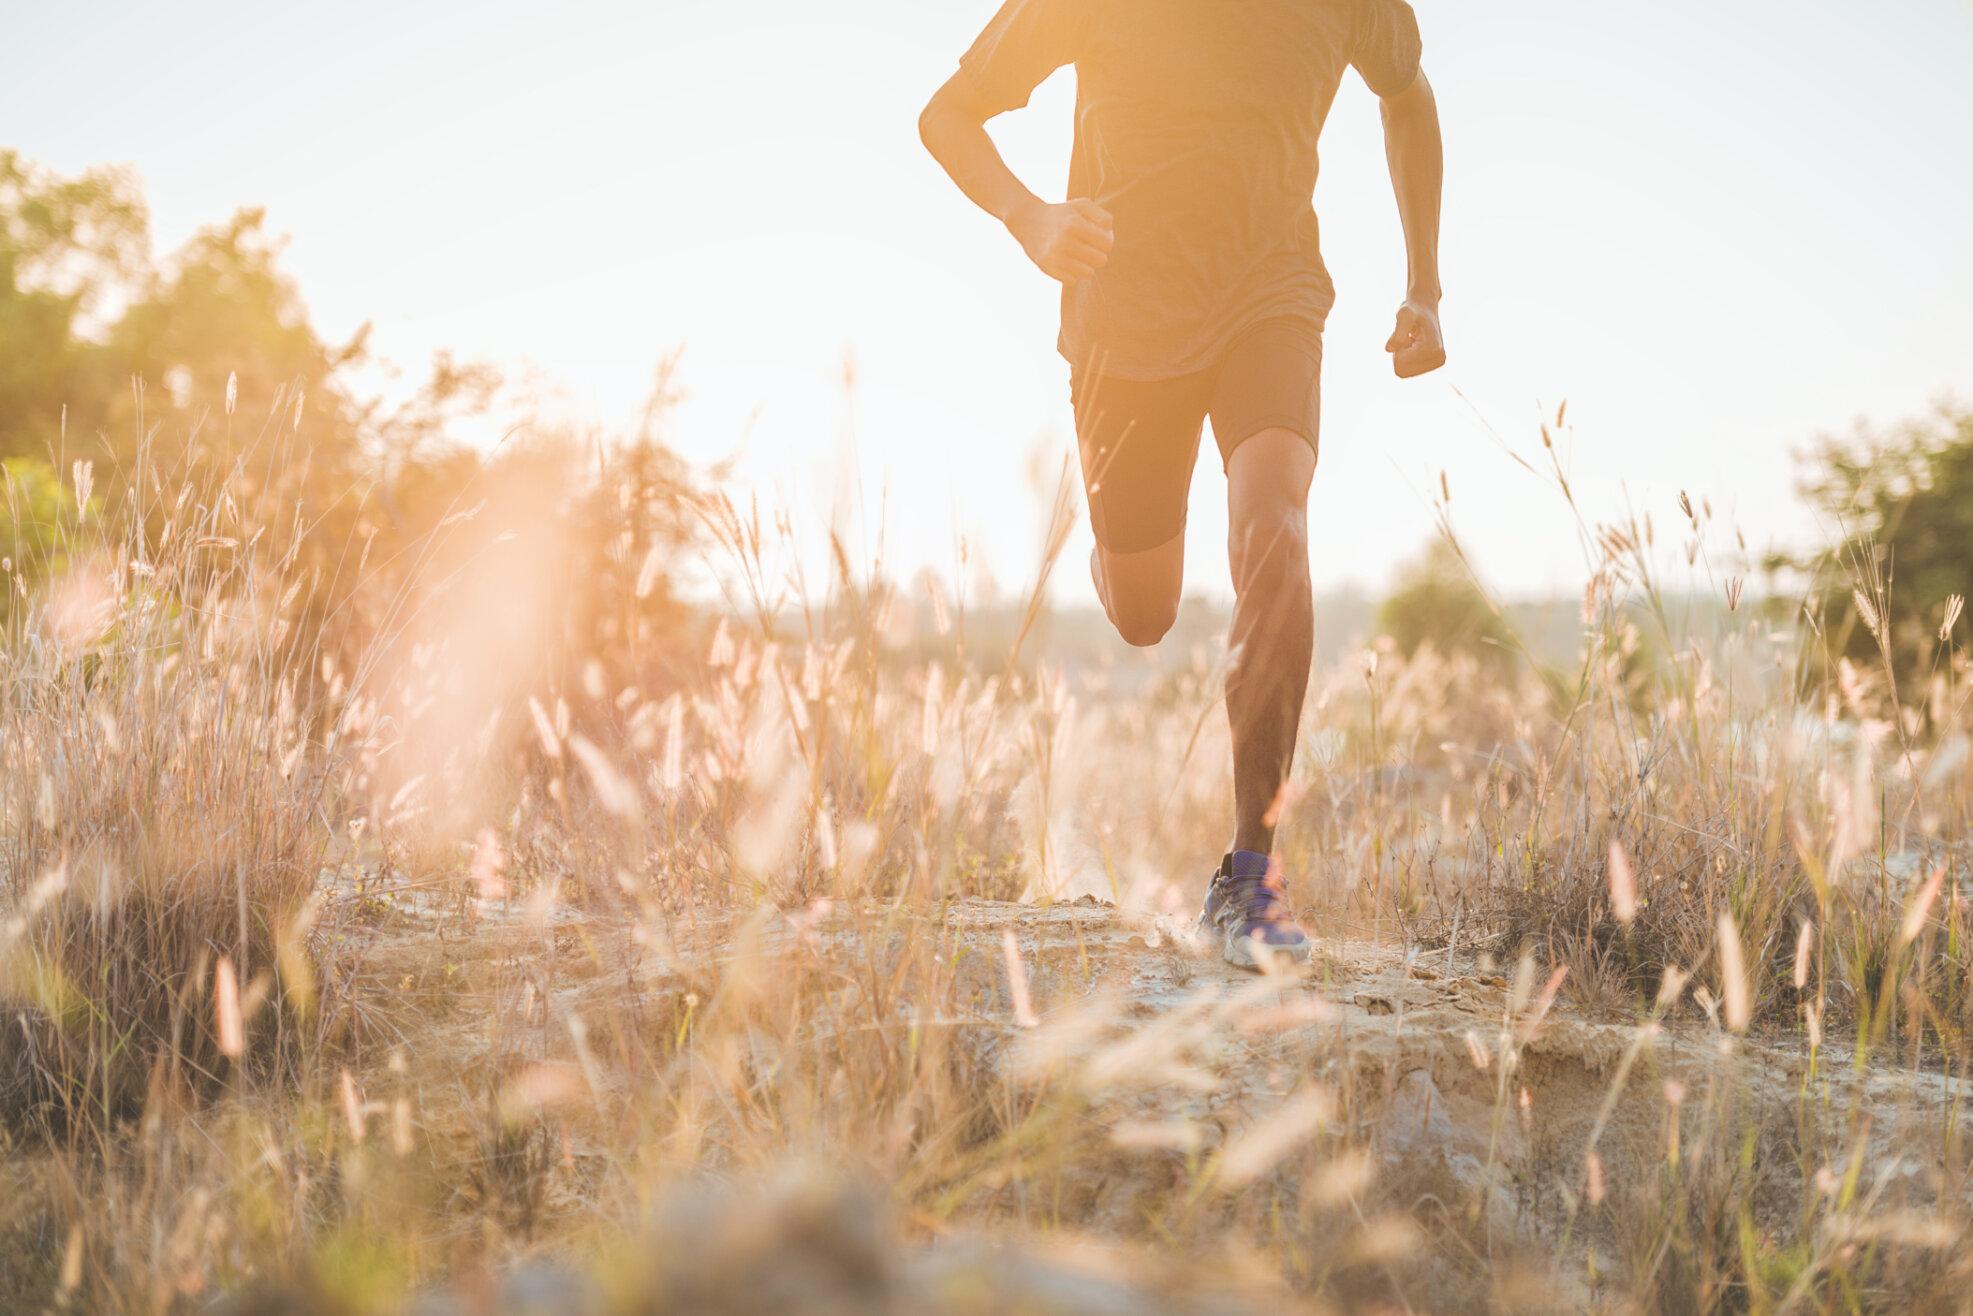 Vertikal Helse 1286062138 jogge eng